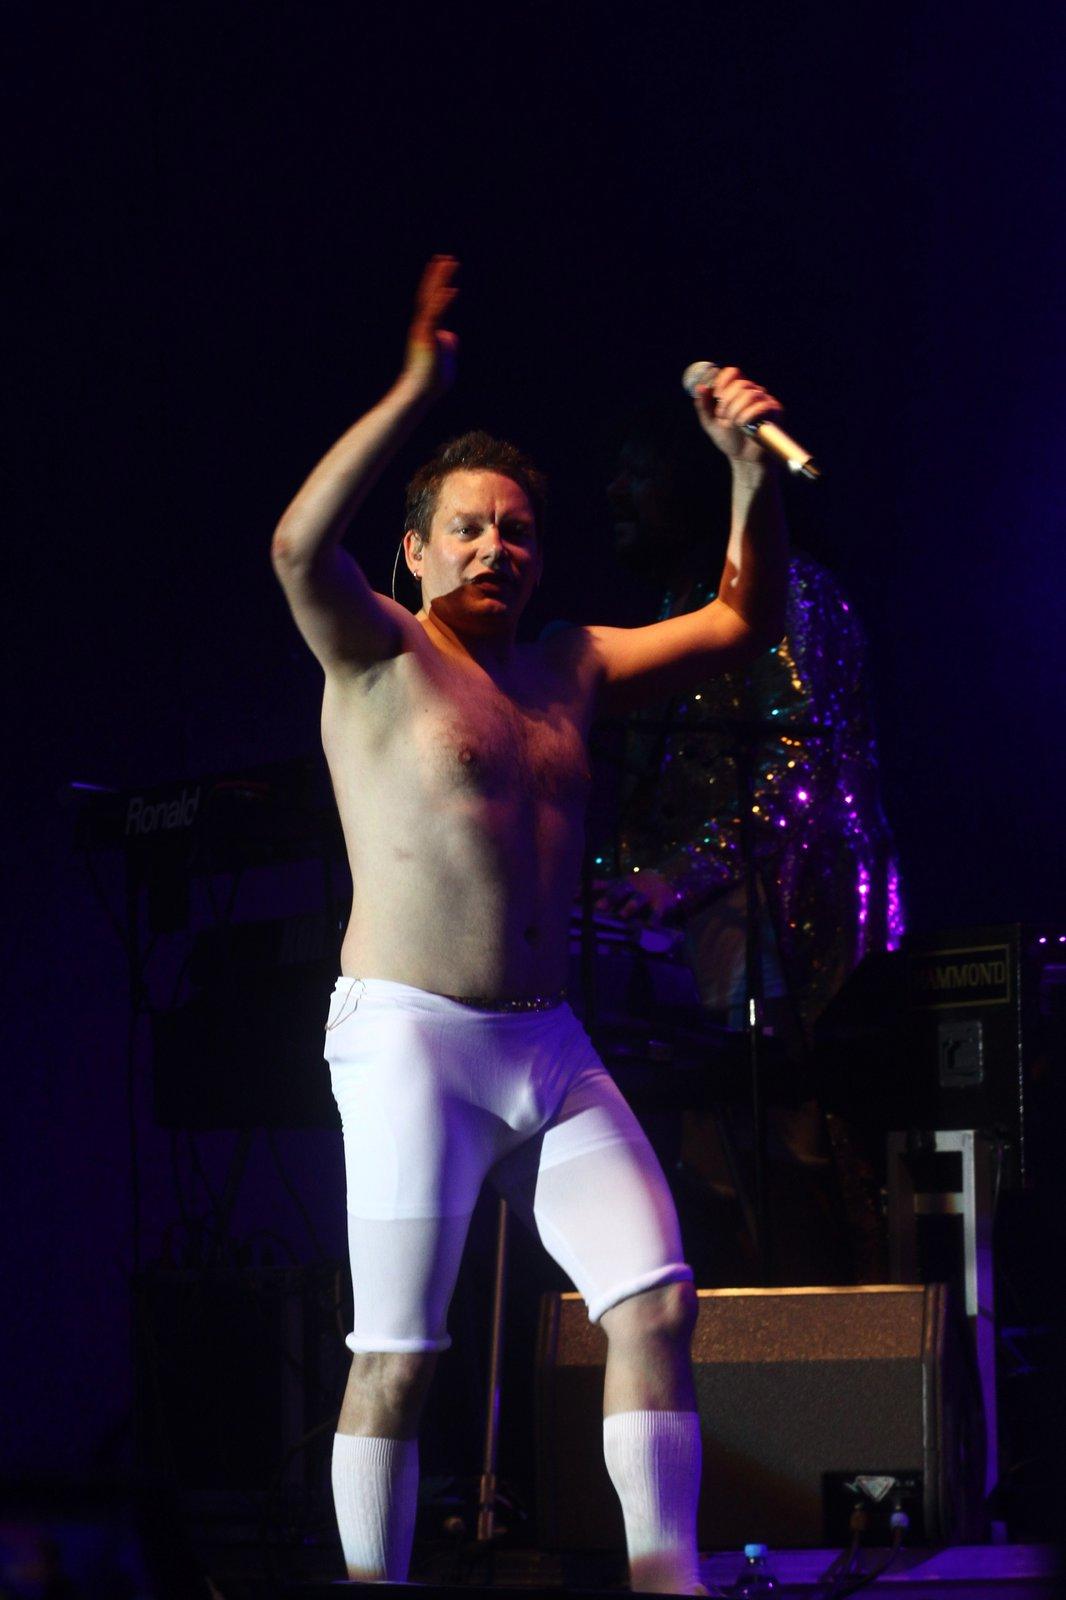 Matěj Ruppert řádil na pódium v bílých elasťákách.